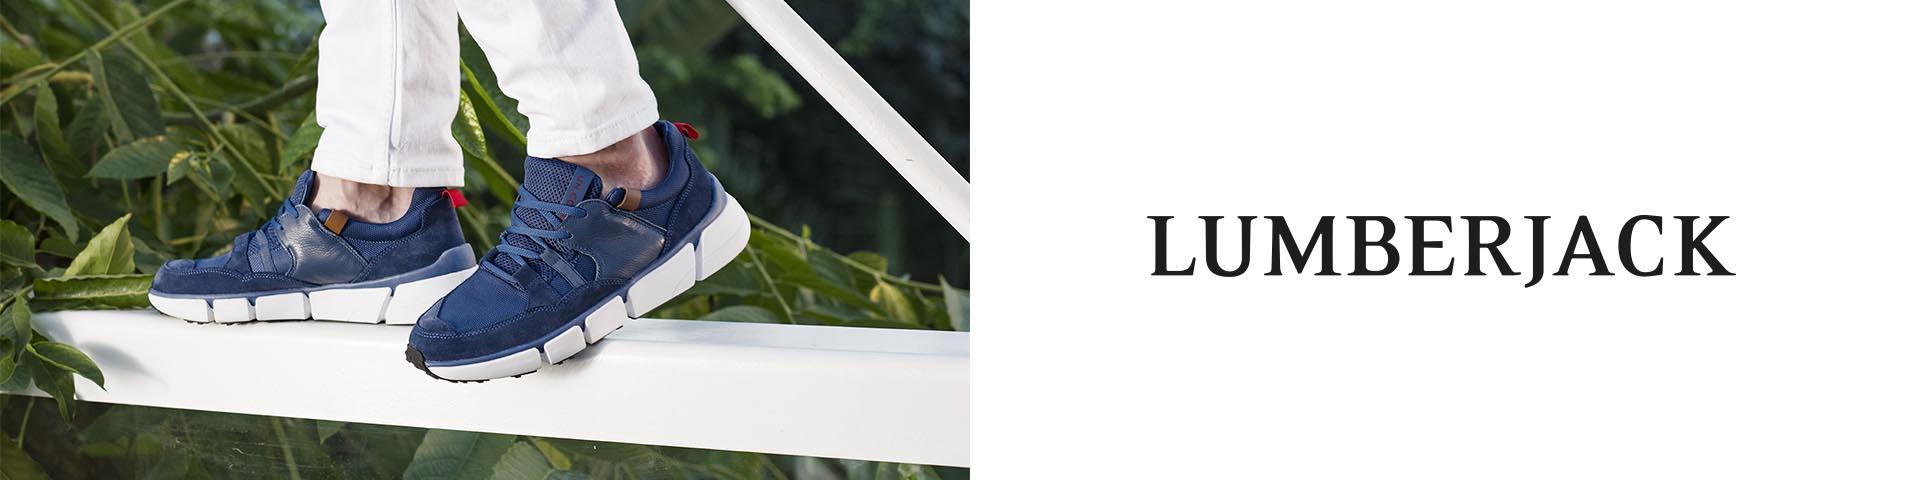 9b01dc3bb62b4b Lumberjack | La nuova collezione online su Zalando